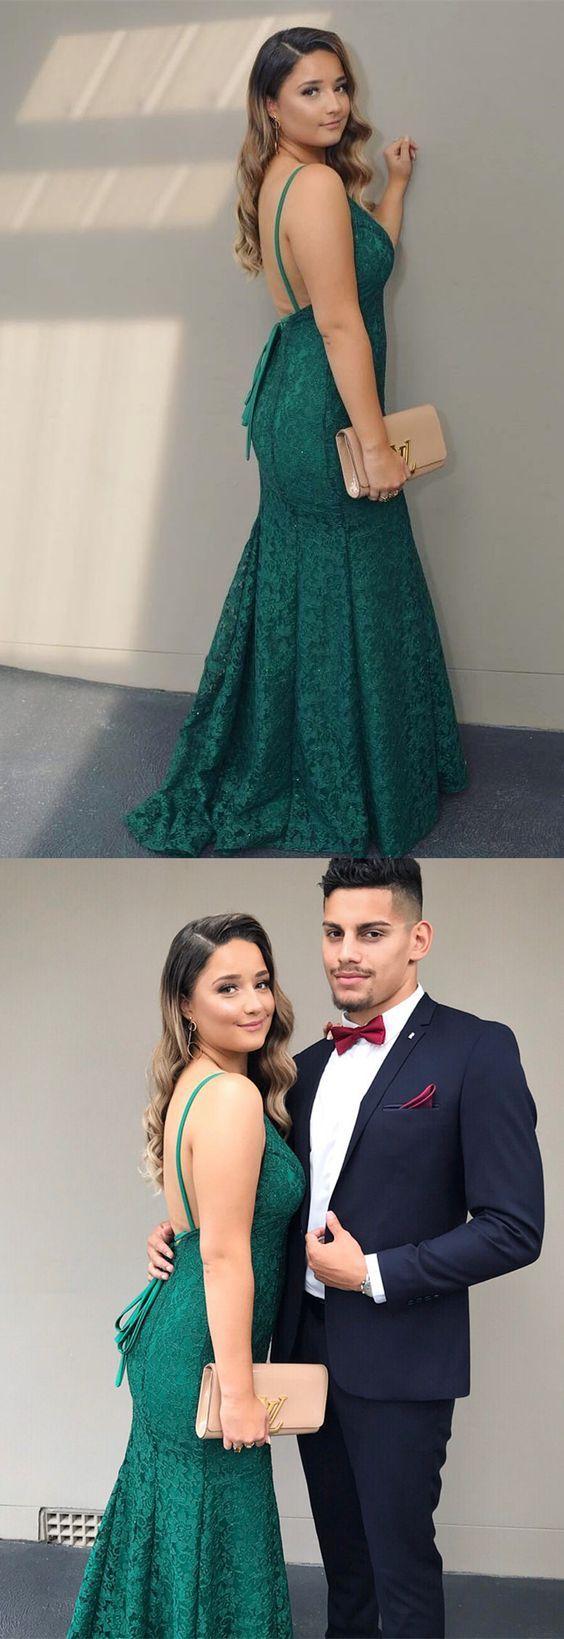 Elegant hunter green lace mermaid long prom dress prom dress